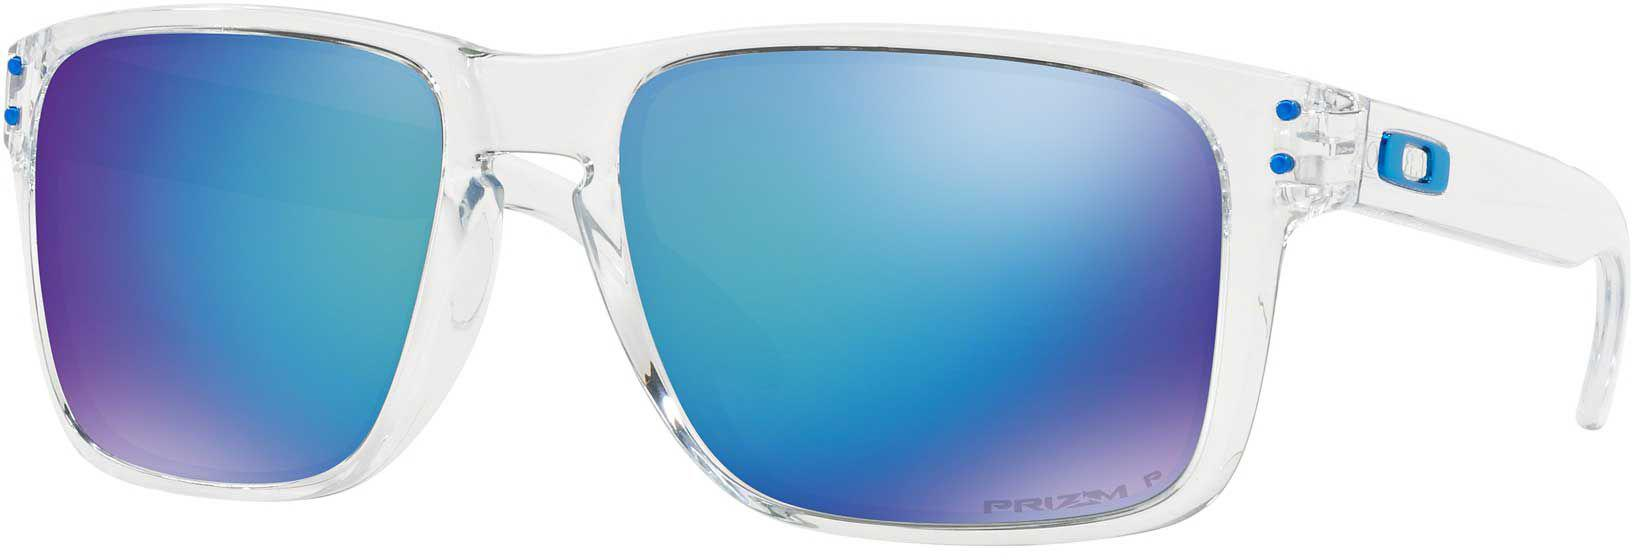 d5d6edaa216 Lyst - Oakley Holbrook Xl Polarized Sunglasses in Blue for Men